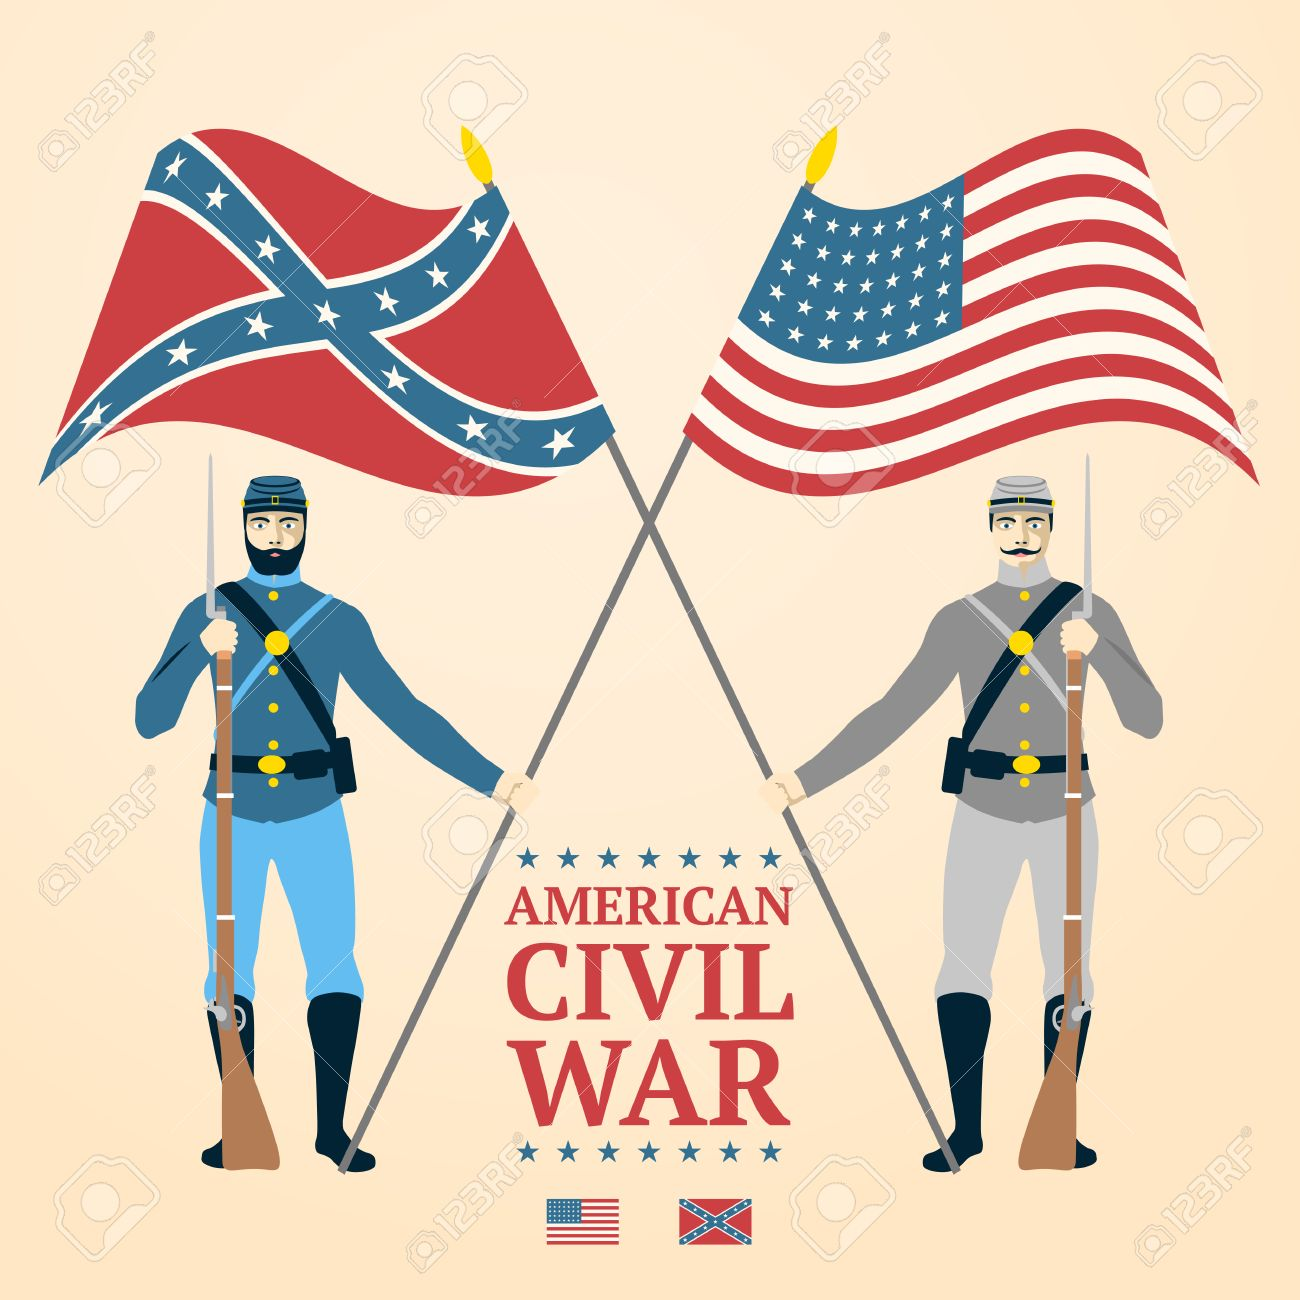 American Civil War illustration.